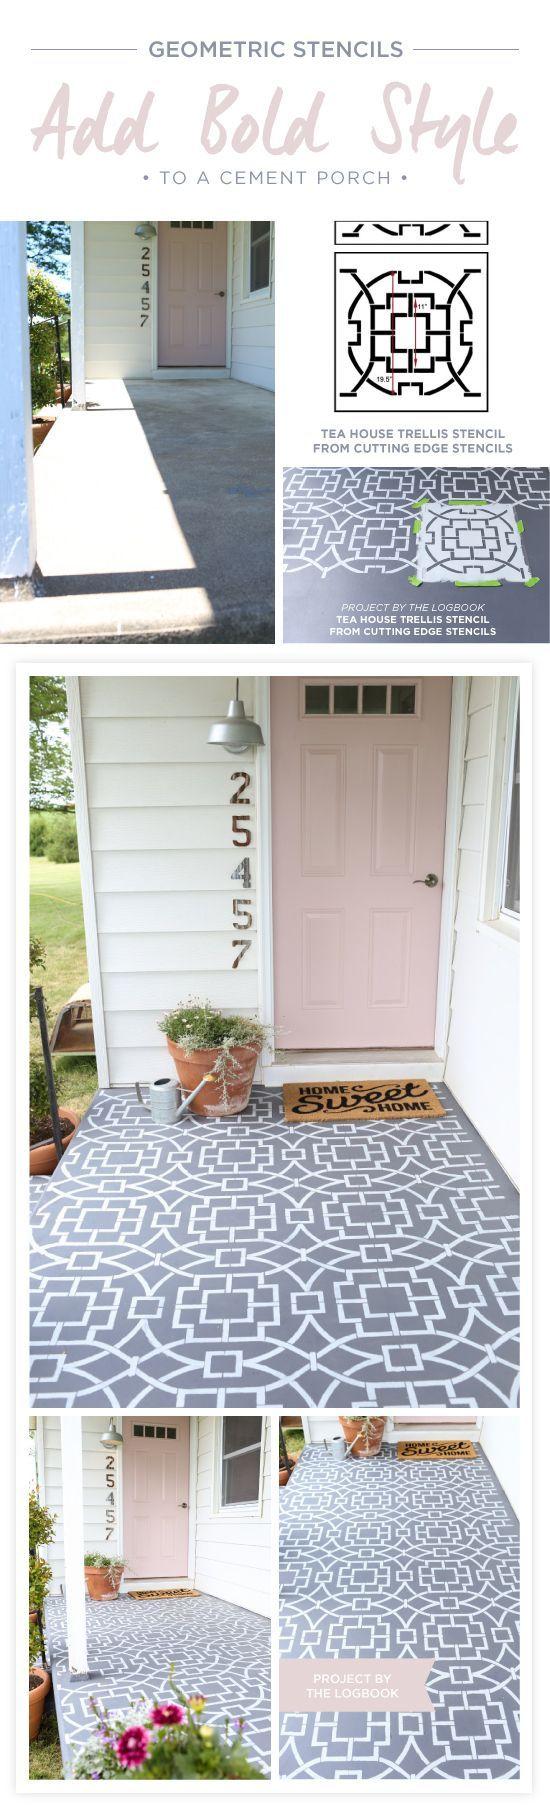 Cutting Edge Stencils shares a DIY stenciled concrete porch makeover using the Tea House Trellis Allover Stencil. www.cuttingedgest...